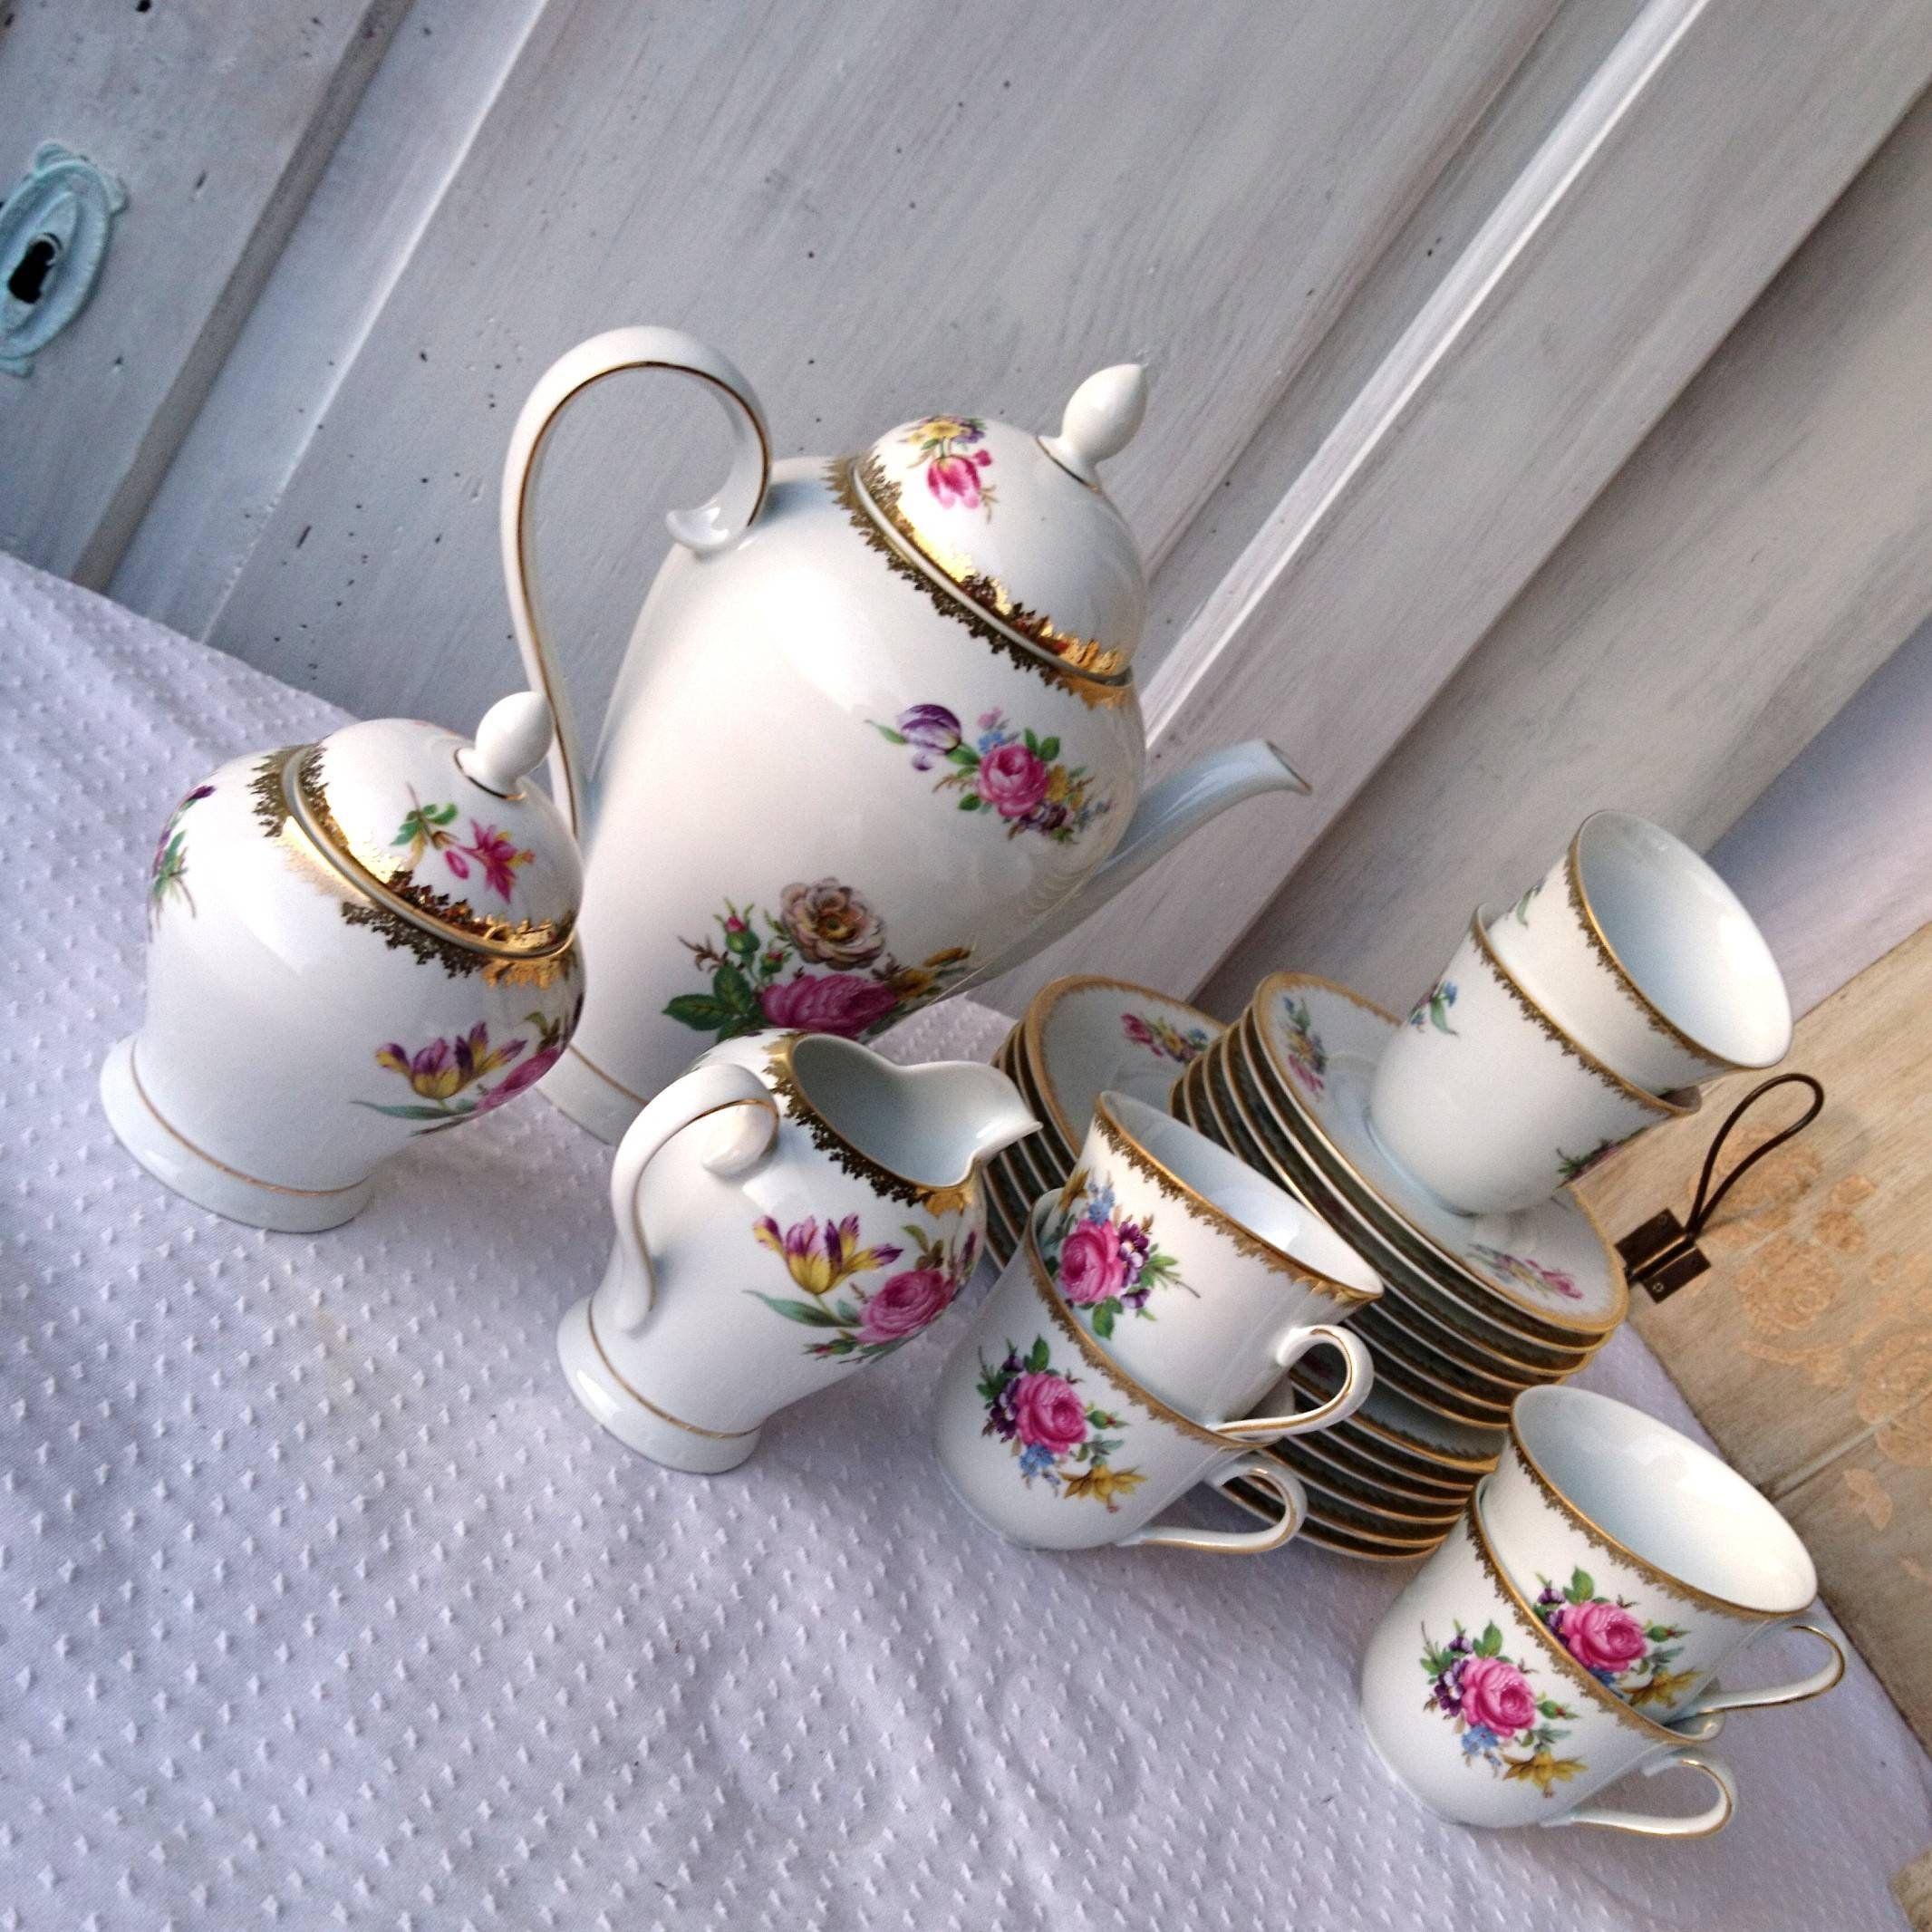 Kaffeeserwice 15tlg Winterling Marktleuthen  Bavaria blumen teller kanne tasse